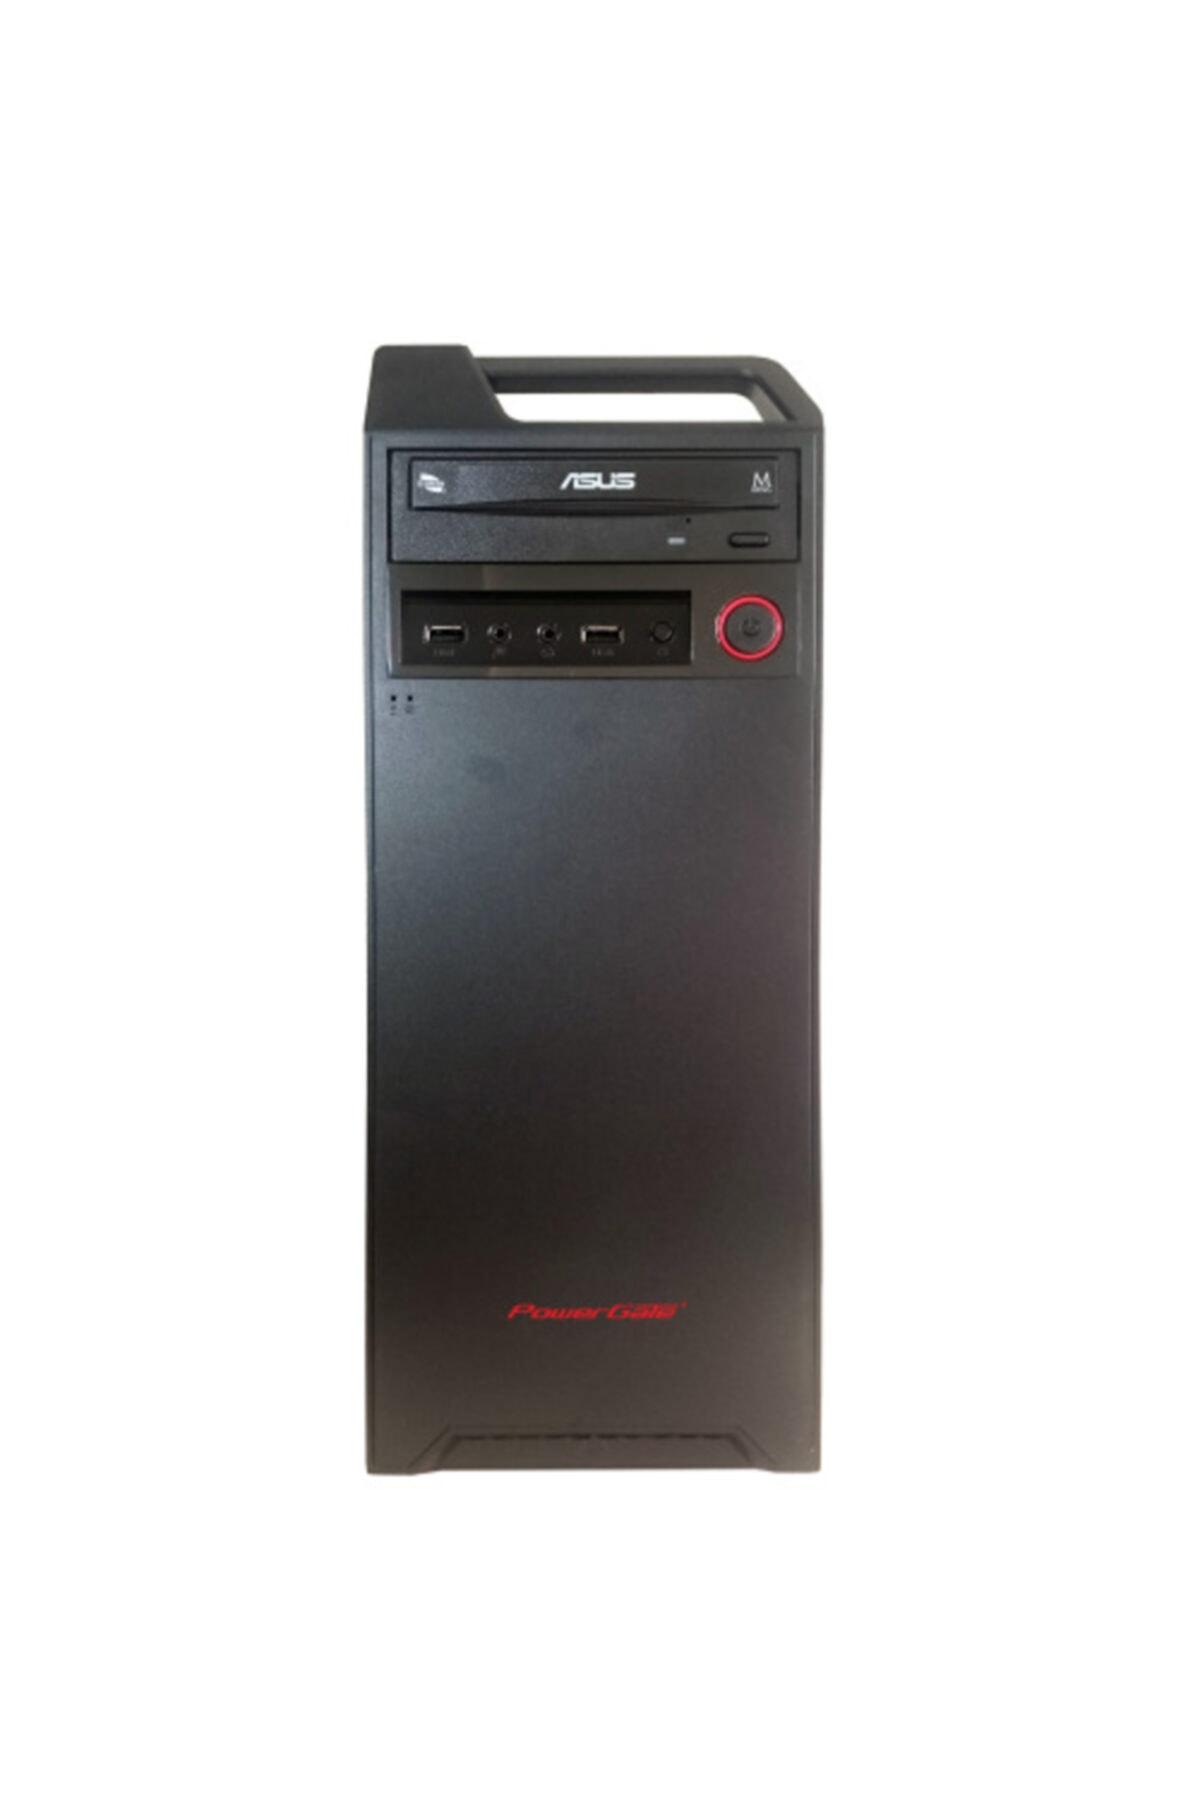 Powergate I3-7100 8gb Ram, 240gb Ssd, Paylaşımlı Ekran Kartı, Free Dos Masaüstü Pc 2